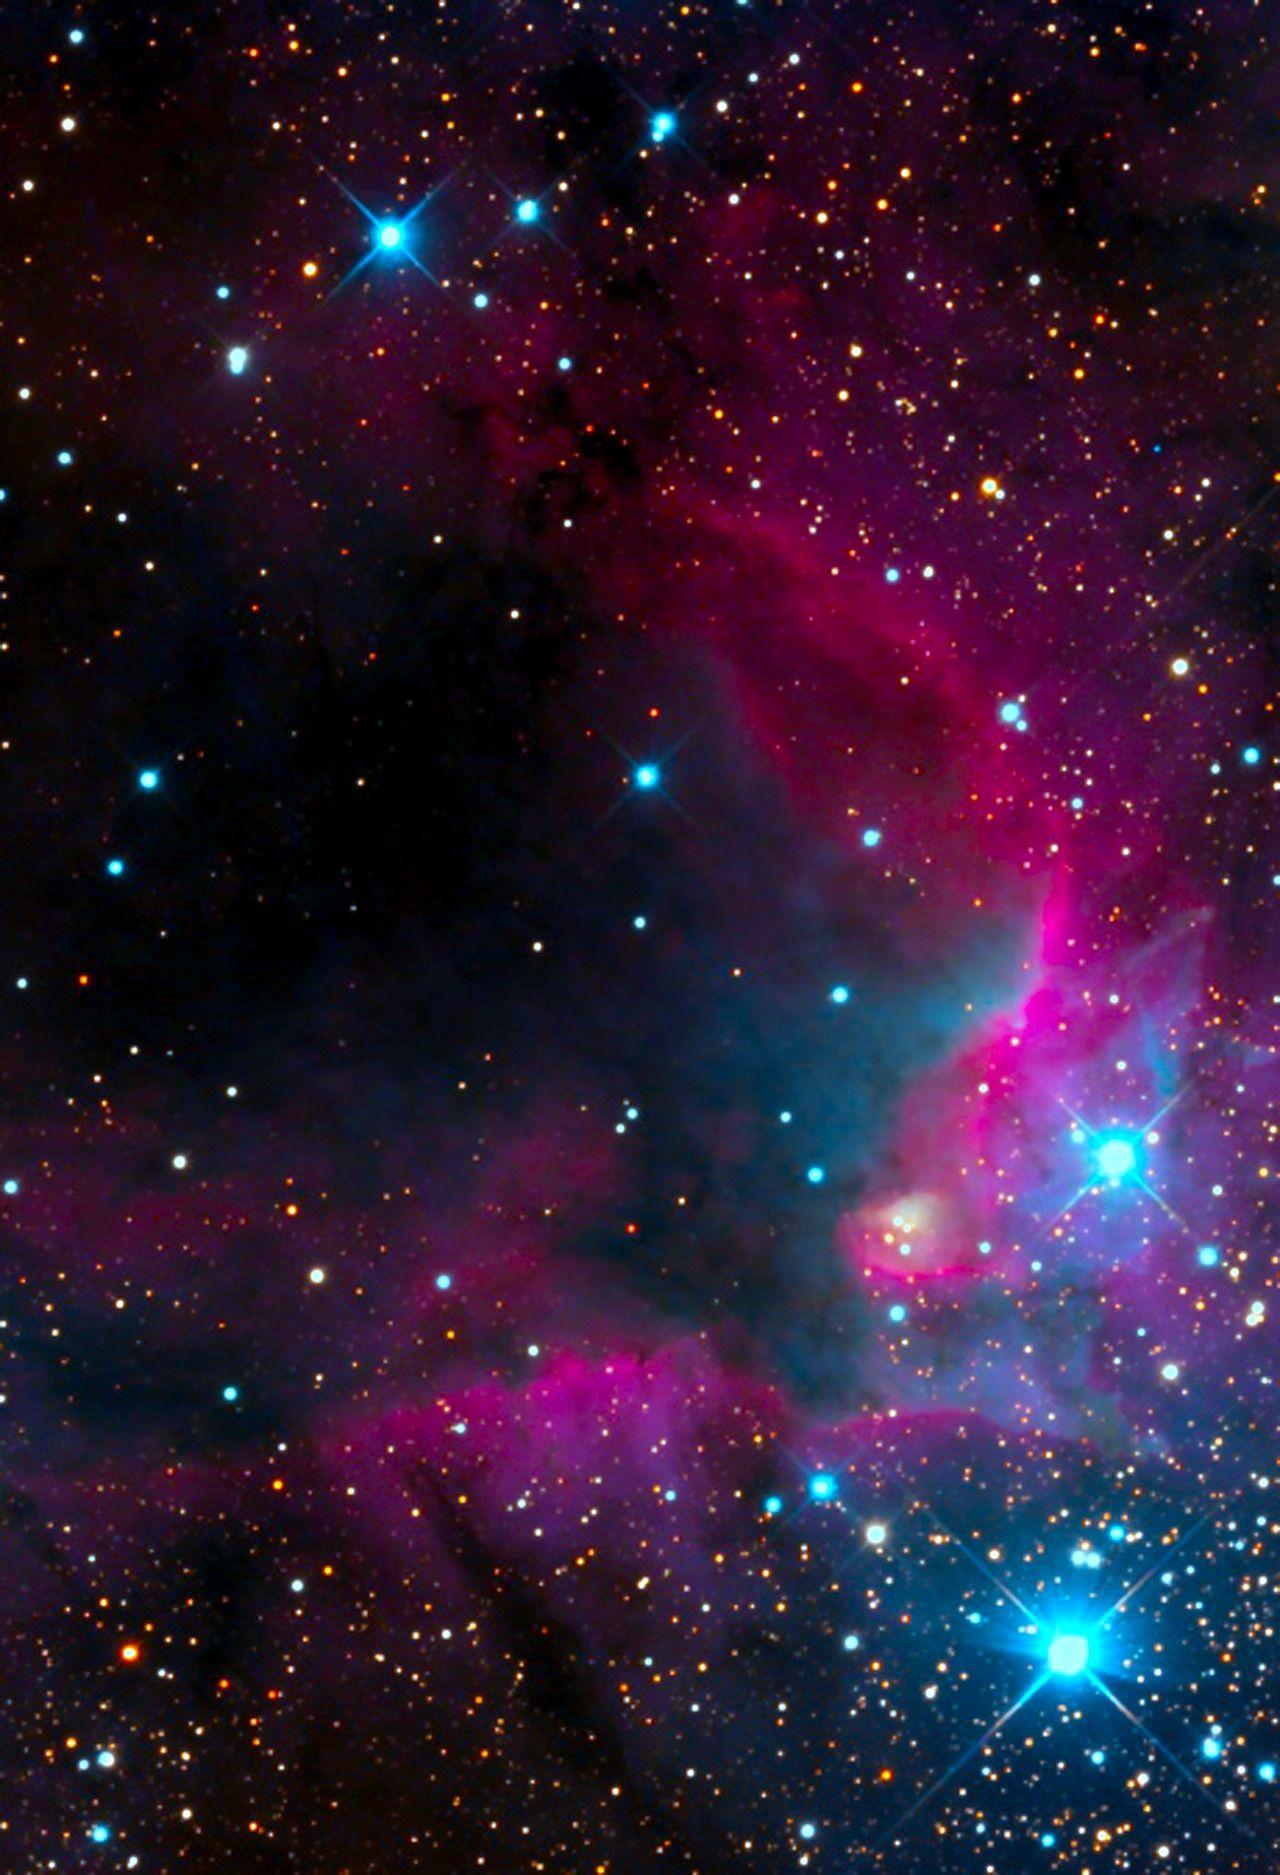 Stellar Indulgence Caldwell 9 The Cave Nebula Copyright Bill Mclaughlin